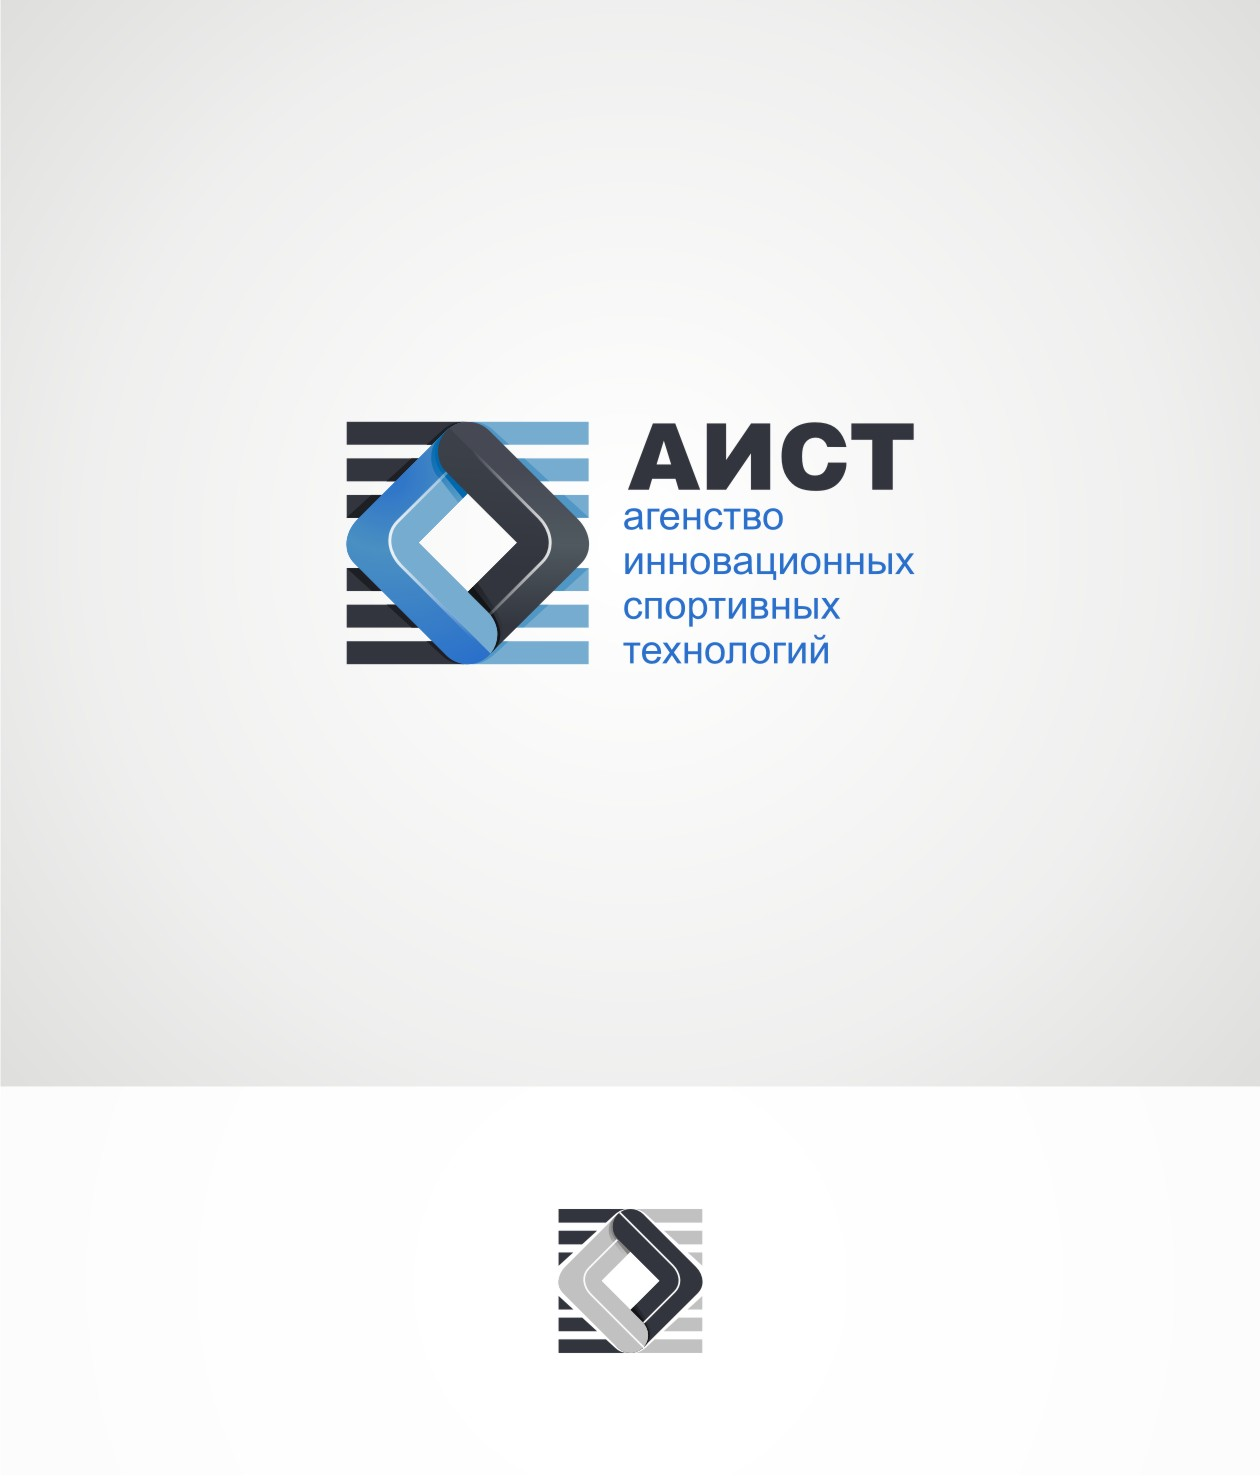 Лого и фирменный стиль (бланк, визитка) фото f_3405177e20e9ad58.jpg